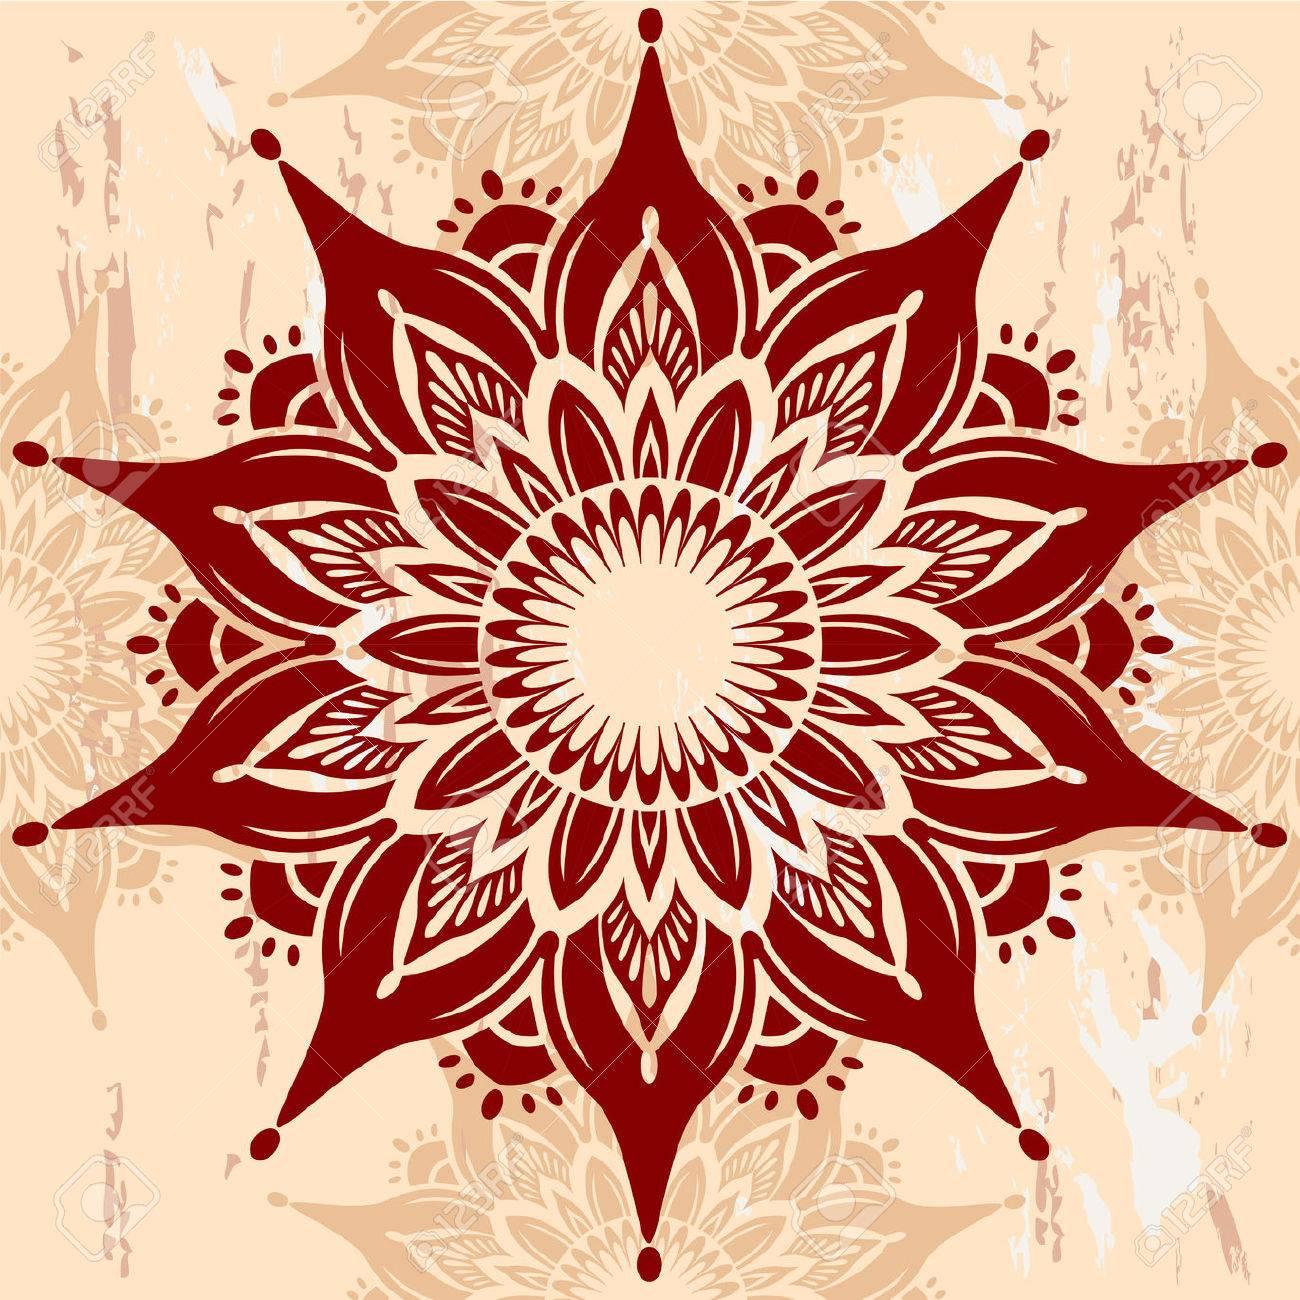 Mandala Round Ornament - 41533926